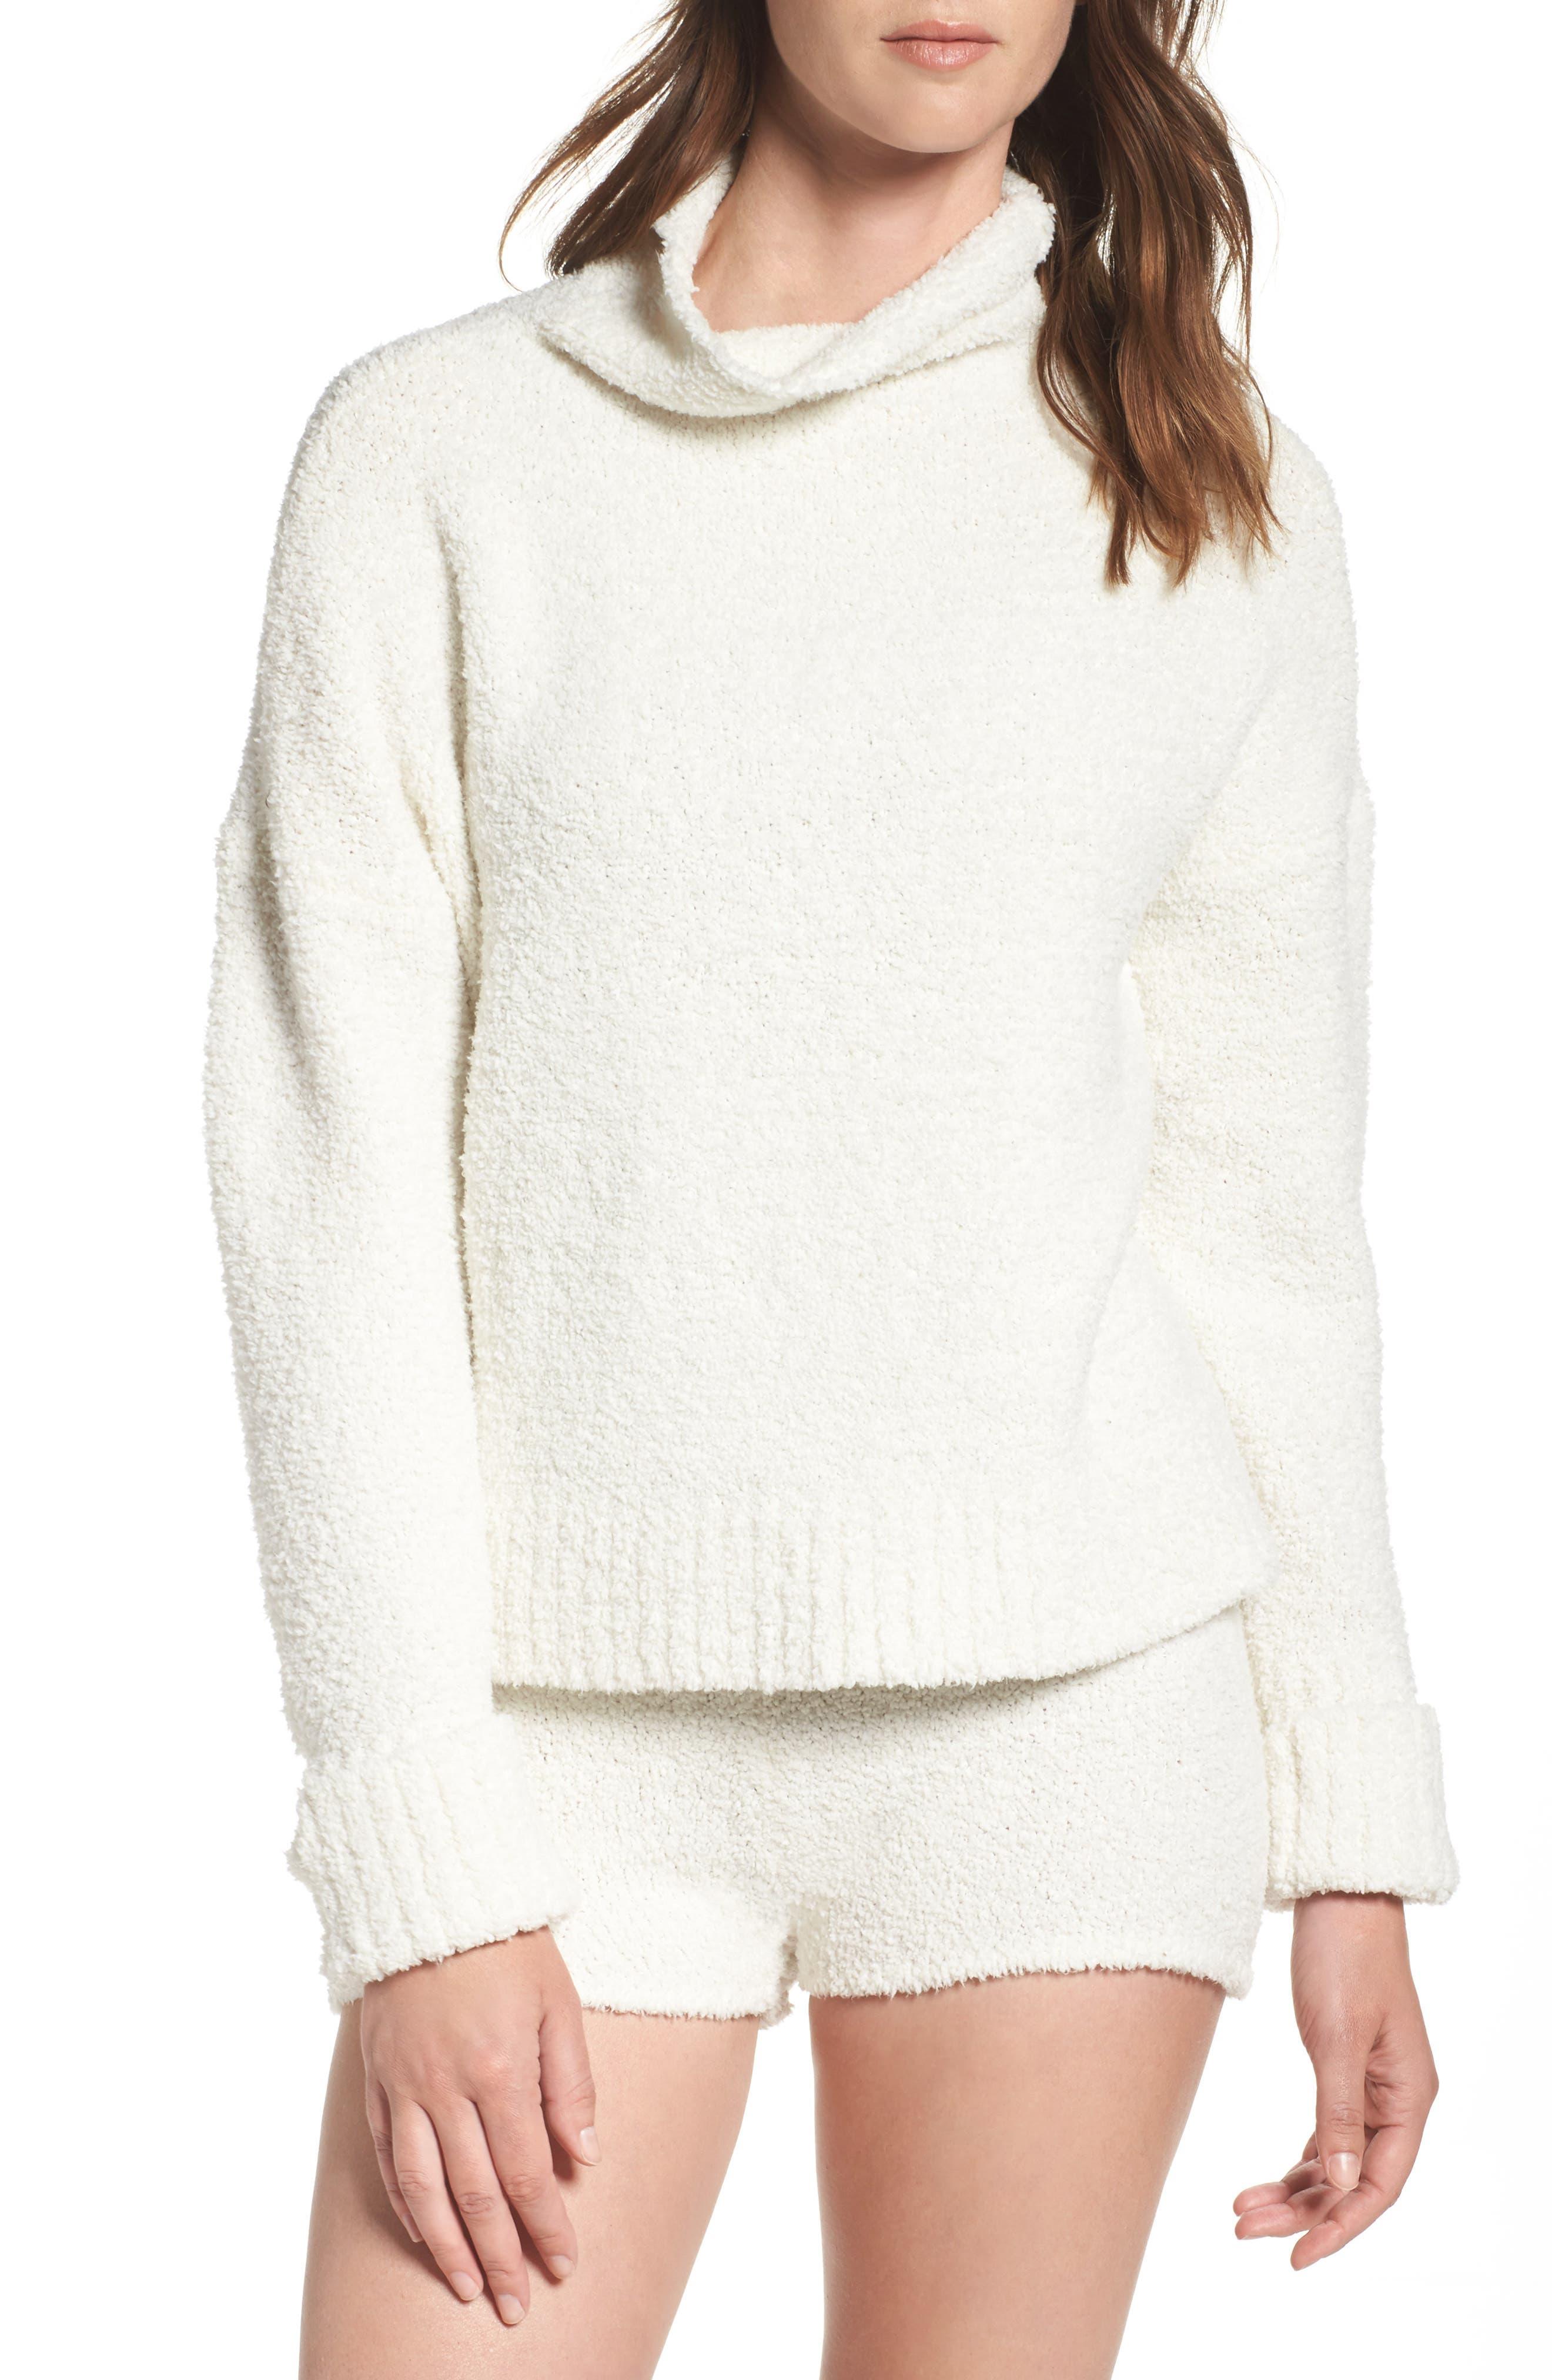 Sweater Knit Pajama Shorts,                             Alternate thumbnail 7, color,                             900